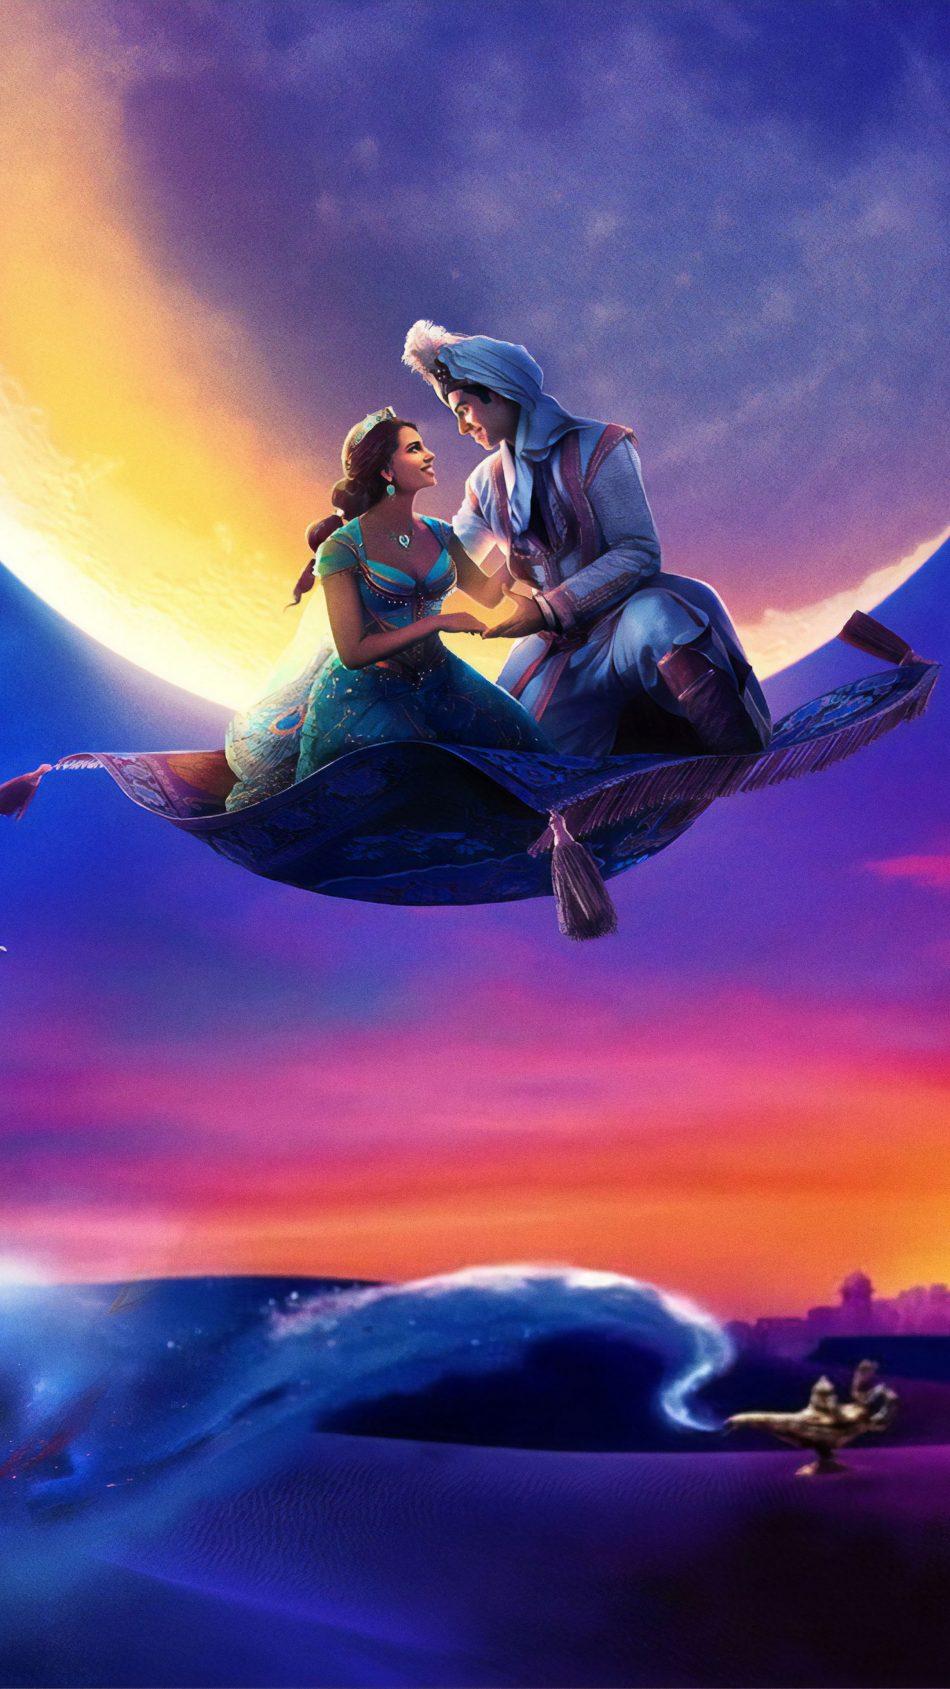 Naomi Scott & Mena Massoud In Aladdin 2019 4K Ultra HD Mobile Wallpaper